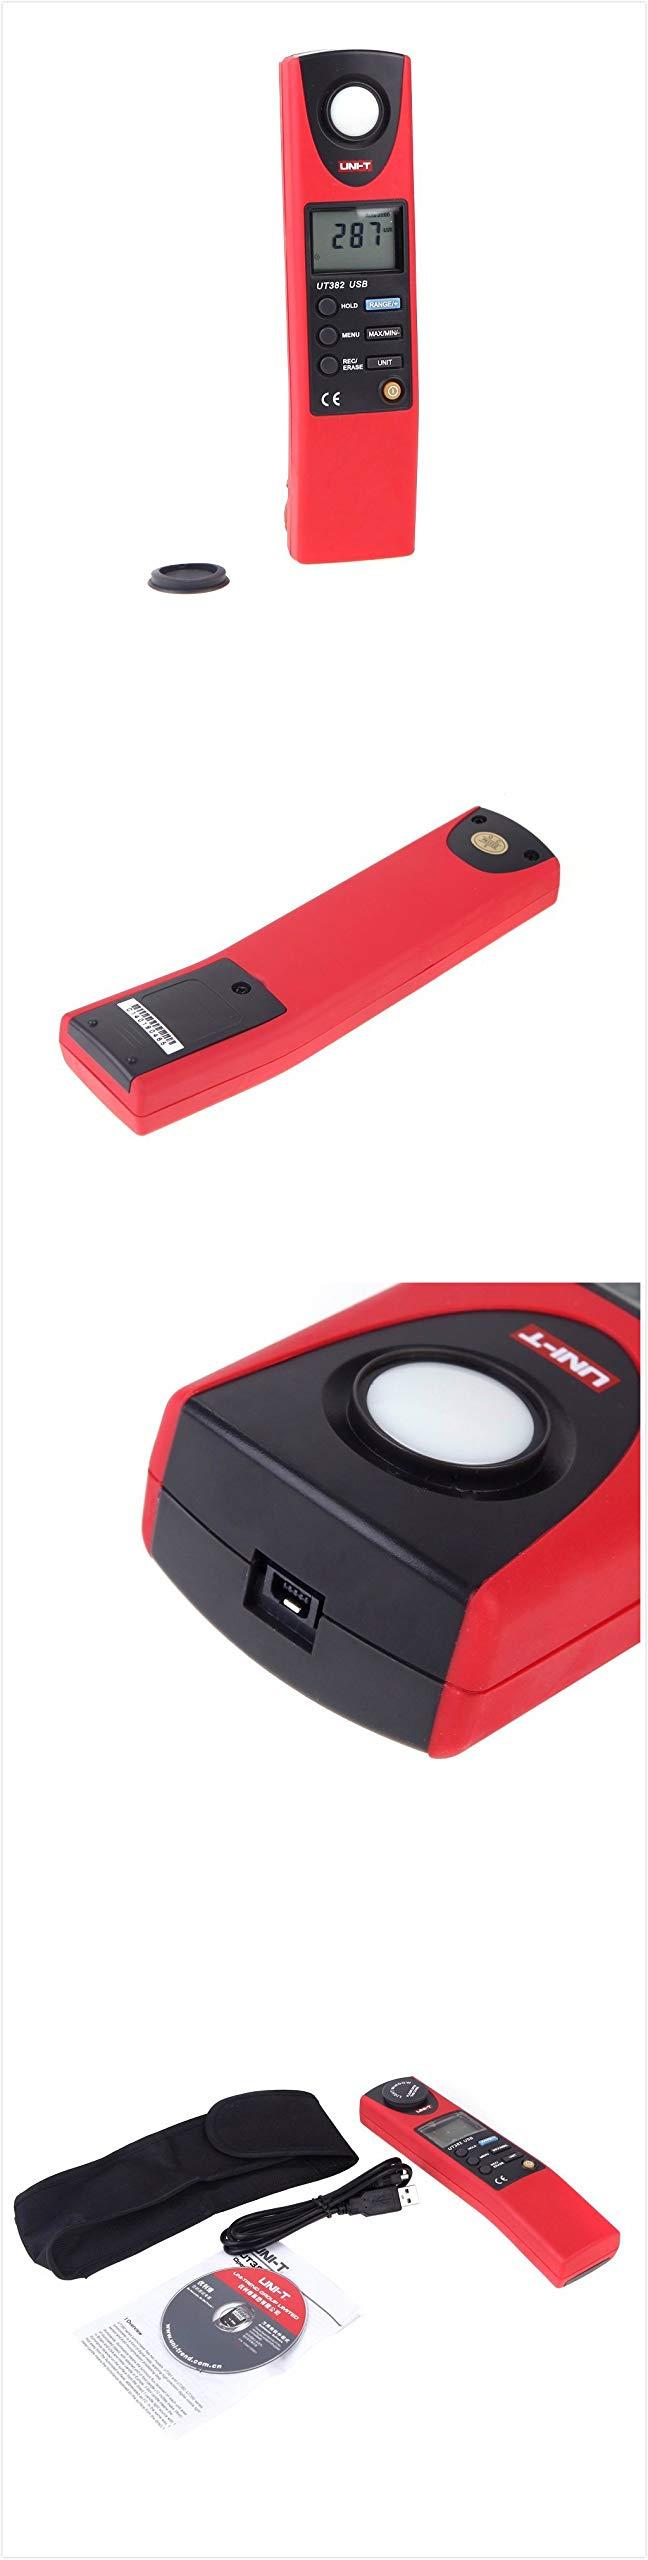 UT382 Split Light Lux Meter Meters 20-20000 Lux Digital Illuminometer USB Transfer